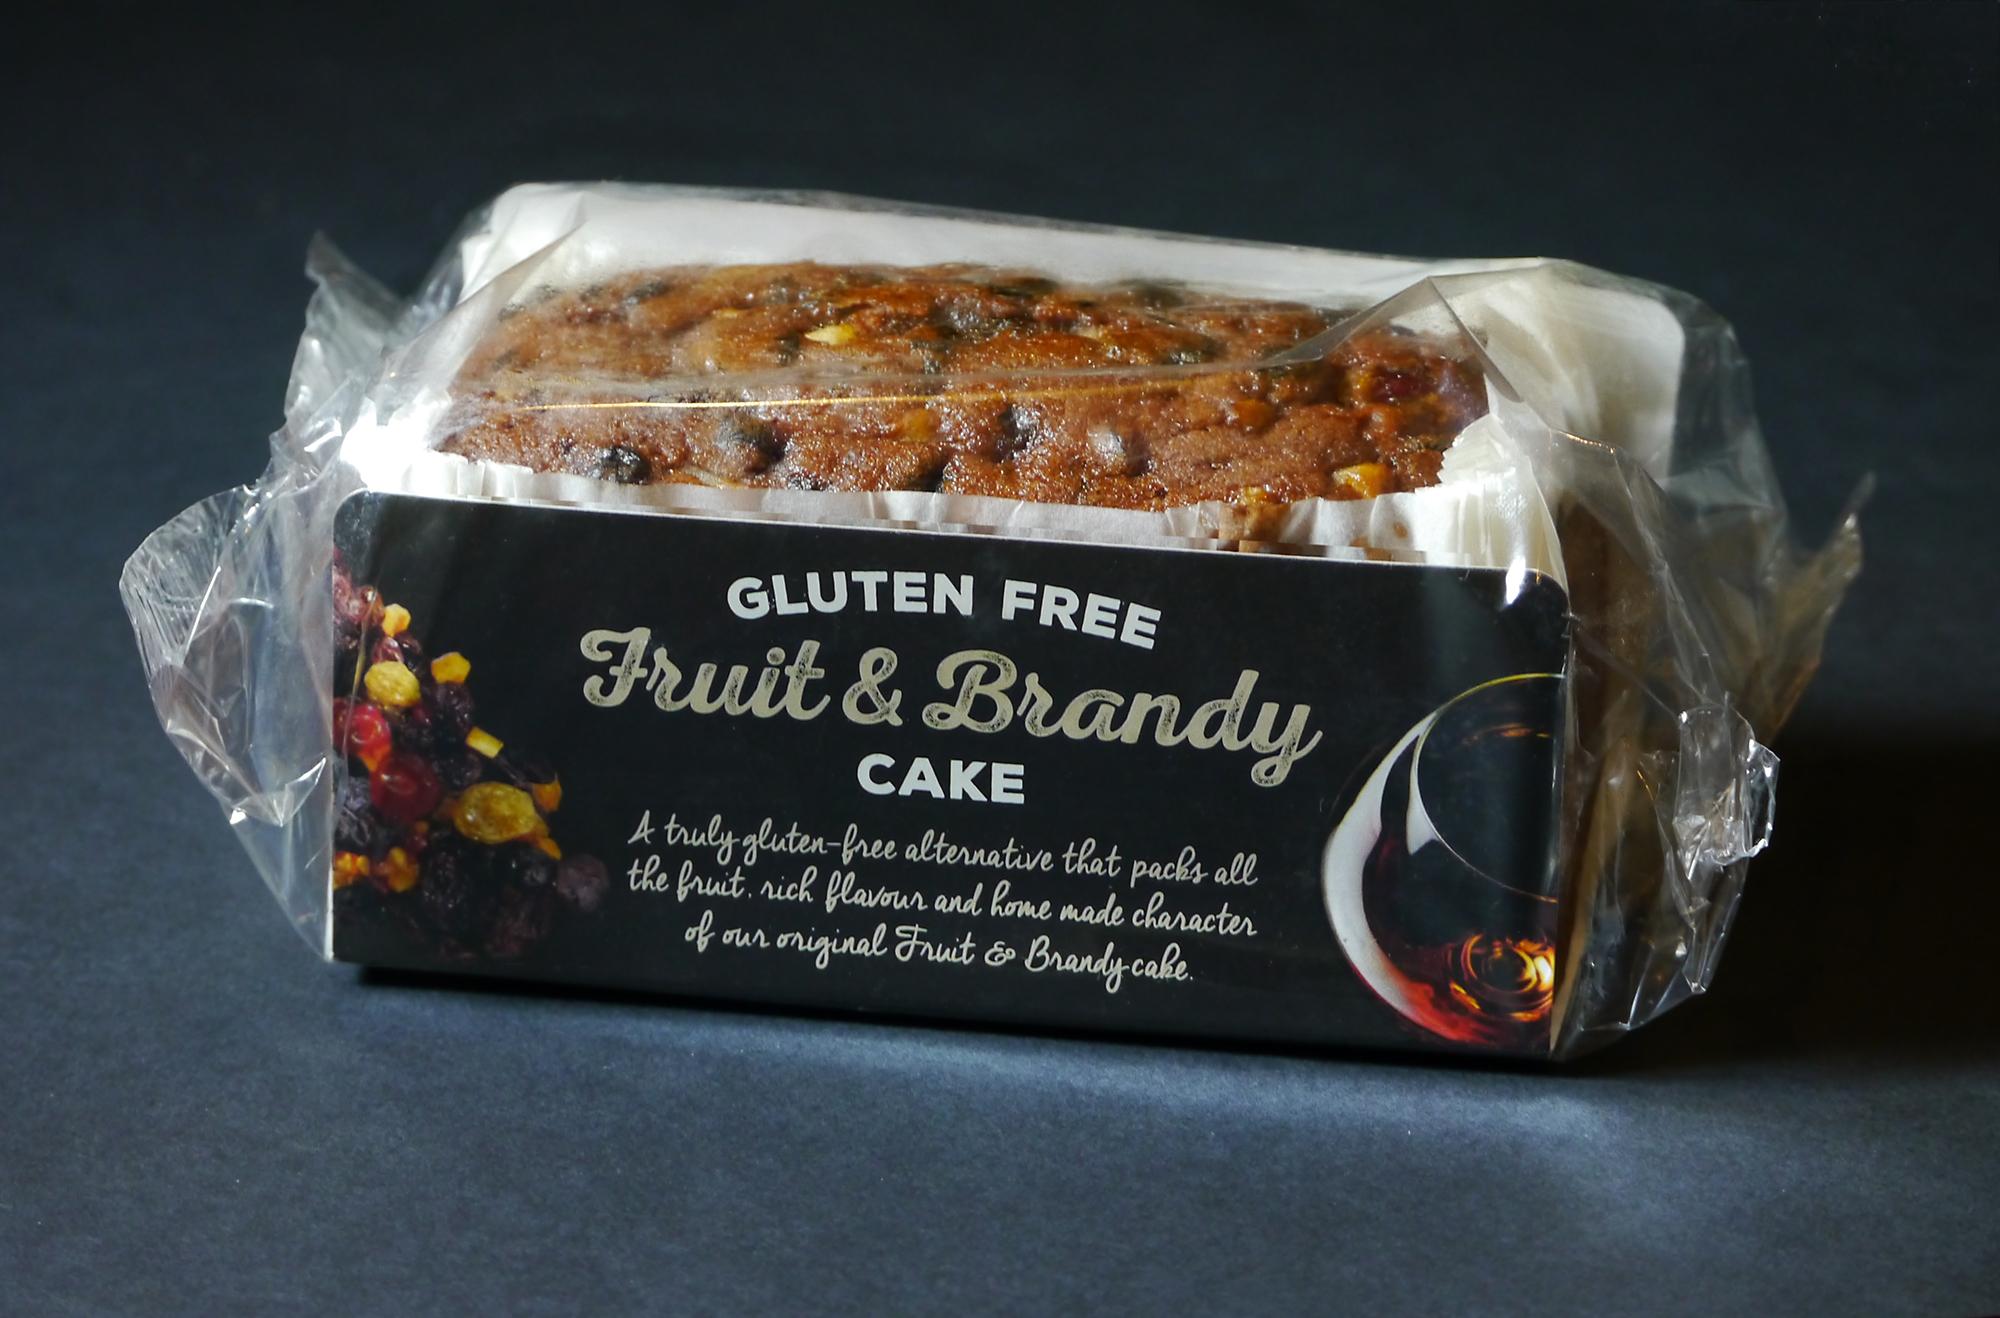 Gluten Free Fruit & Brandy Small Packshot